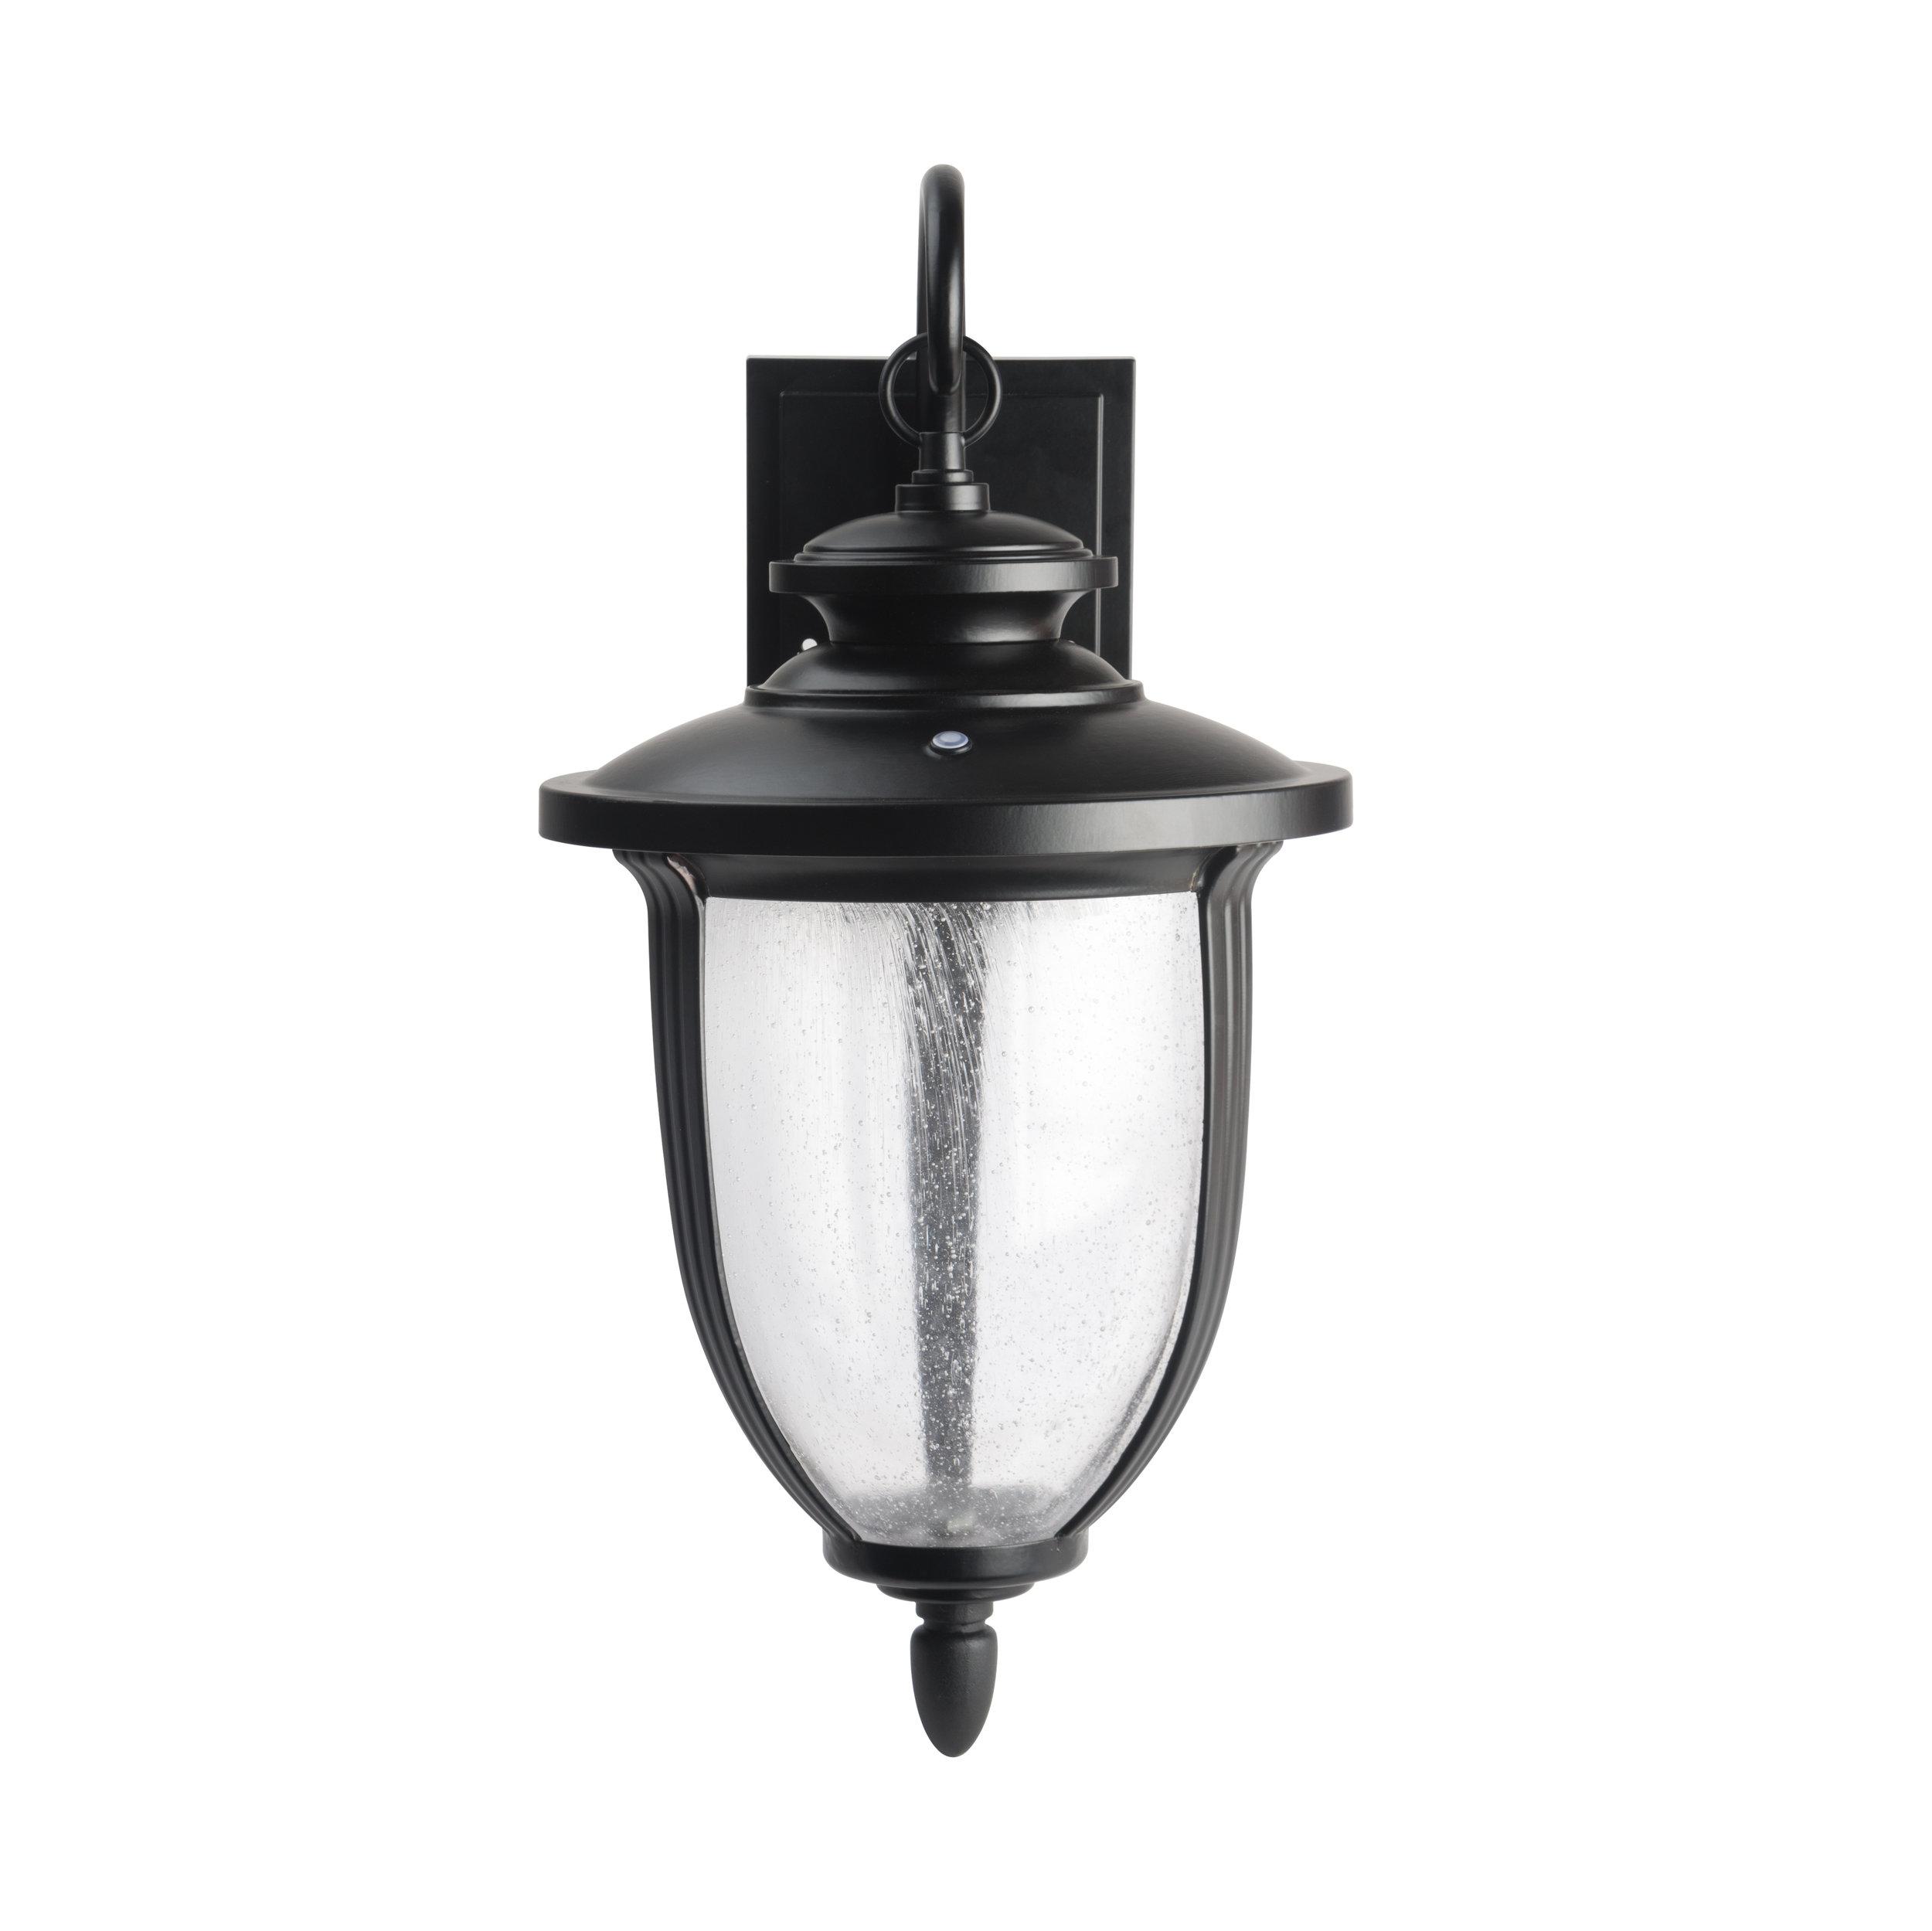 IDC-LAMP-1.jpg